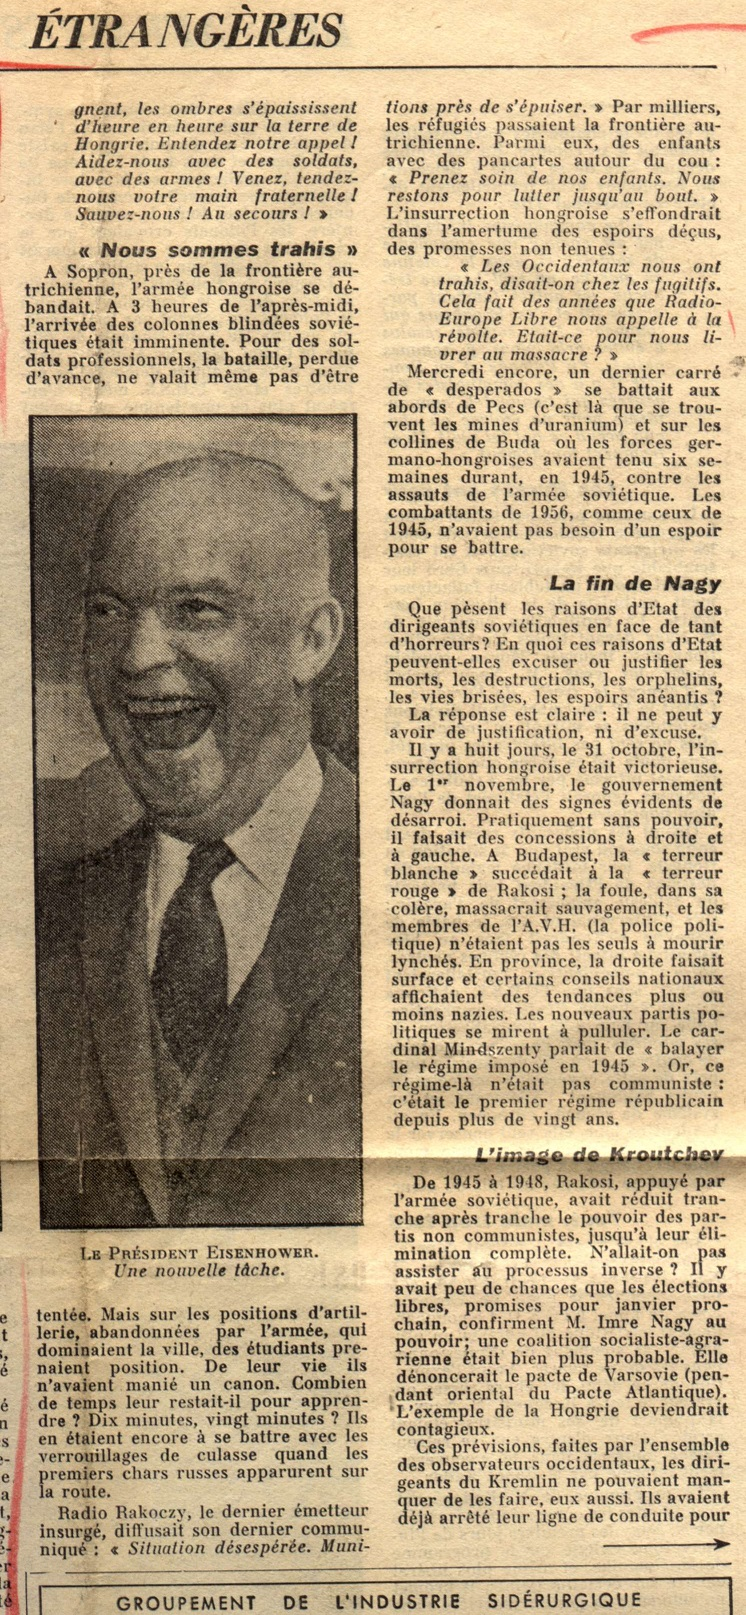 Eisenhower 300-5-48--3-1-1_000249.jpg